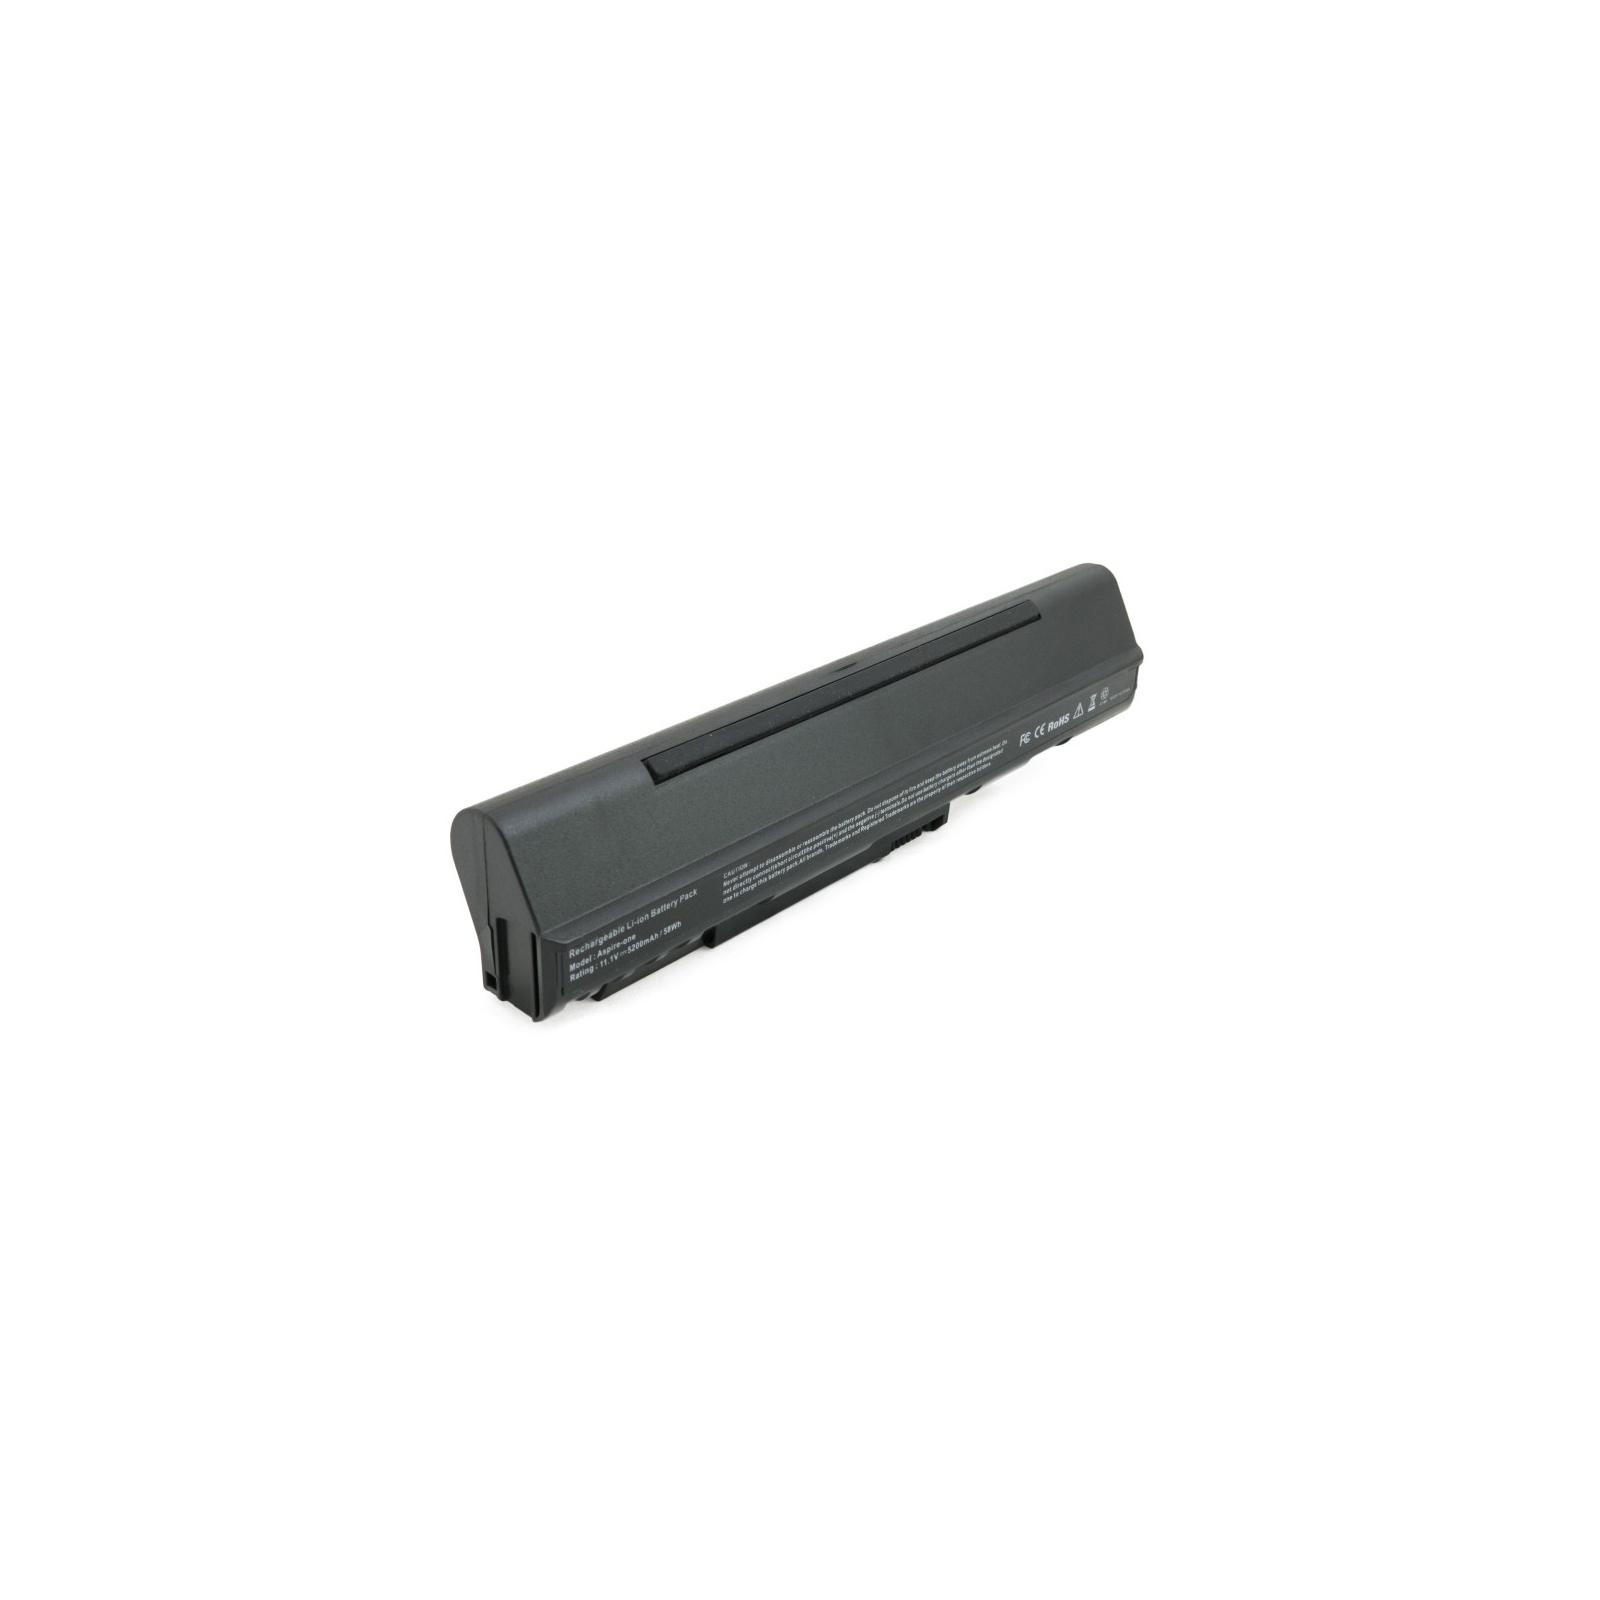 Аккумулятор для ноутбука Acer Aspire One A150 (UM08A71) 5200 mAh EXTRADIGITAL (BNA3914)